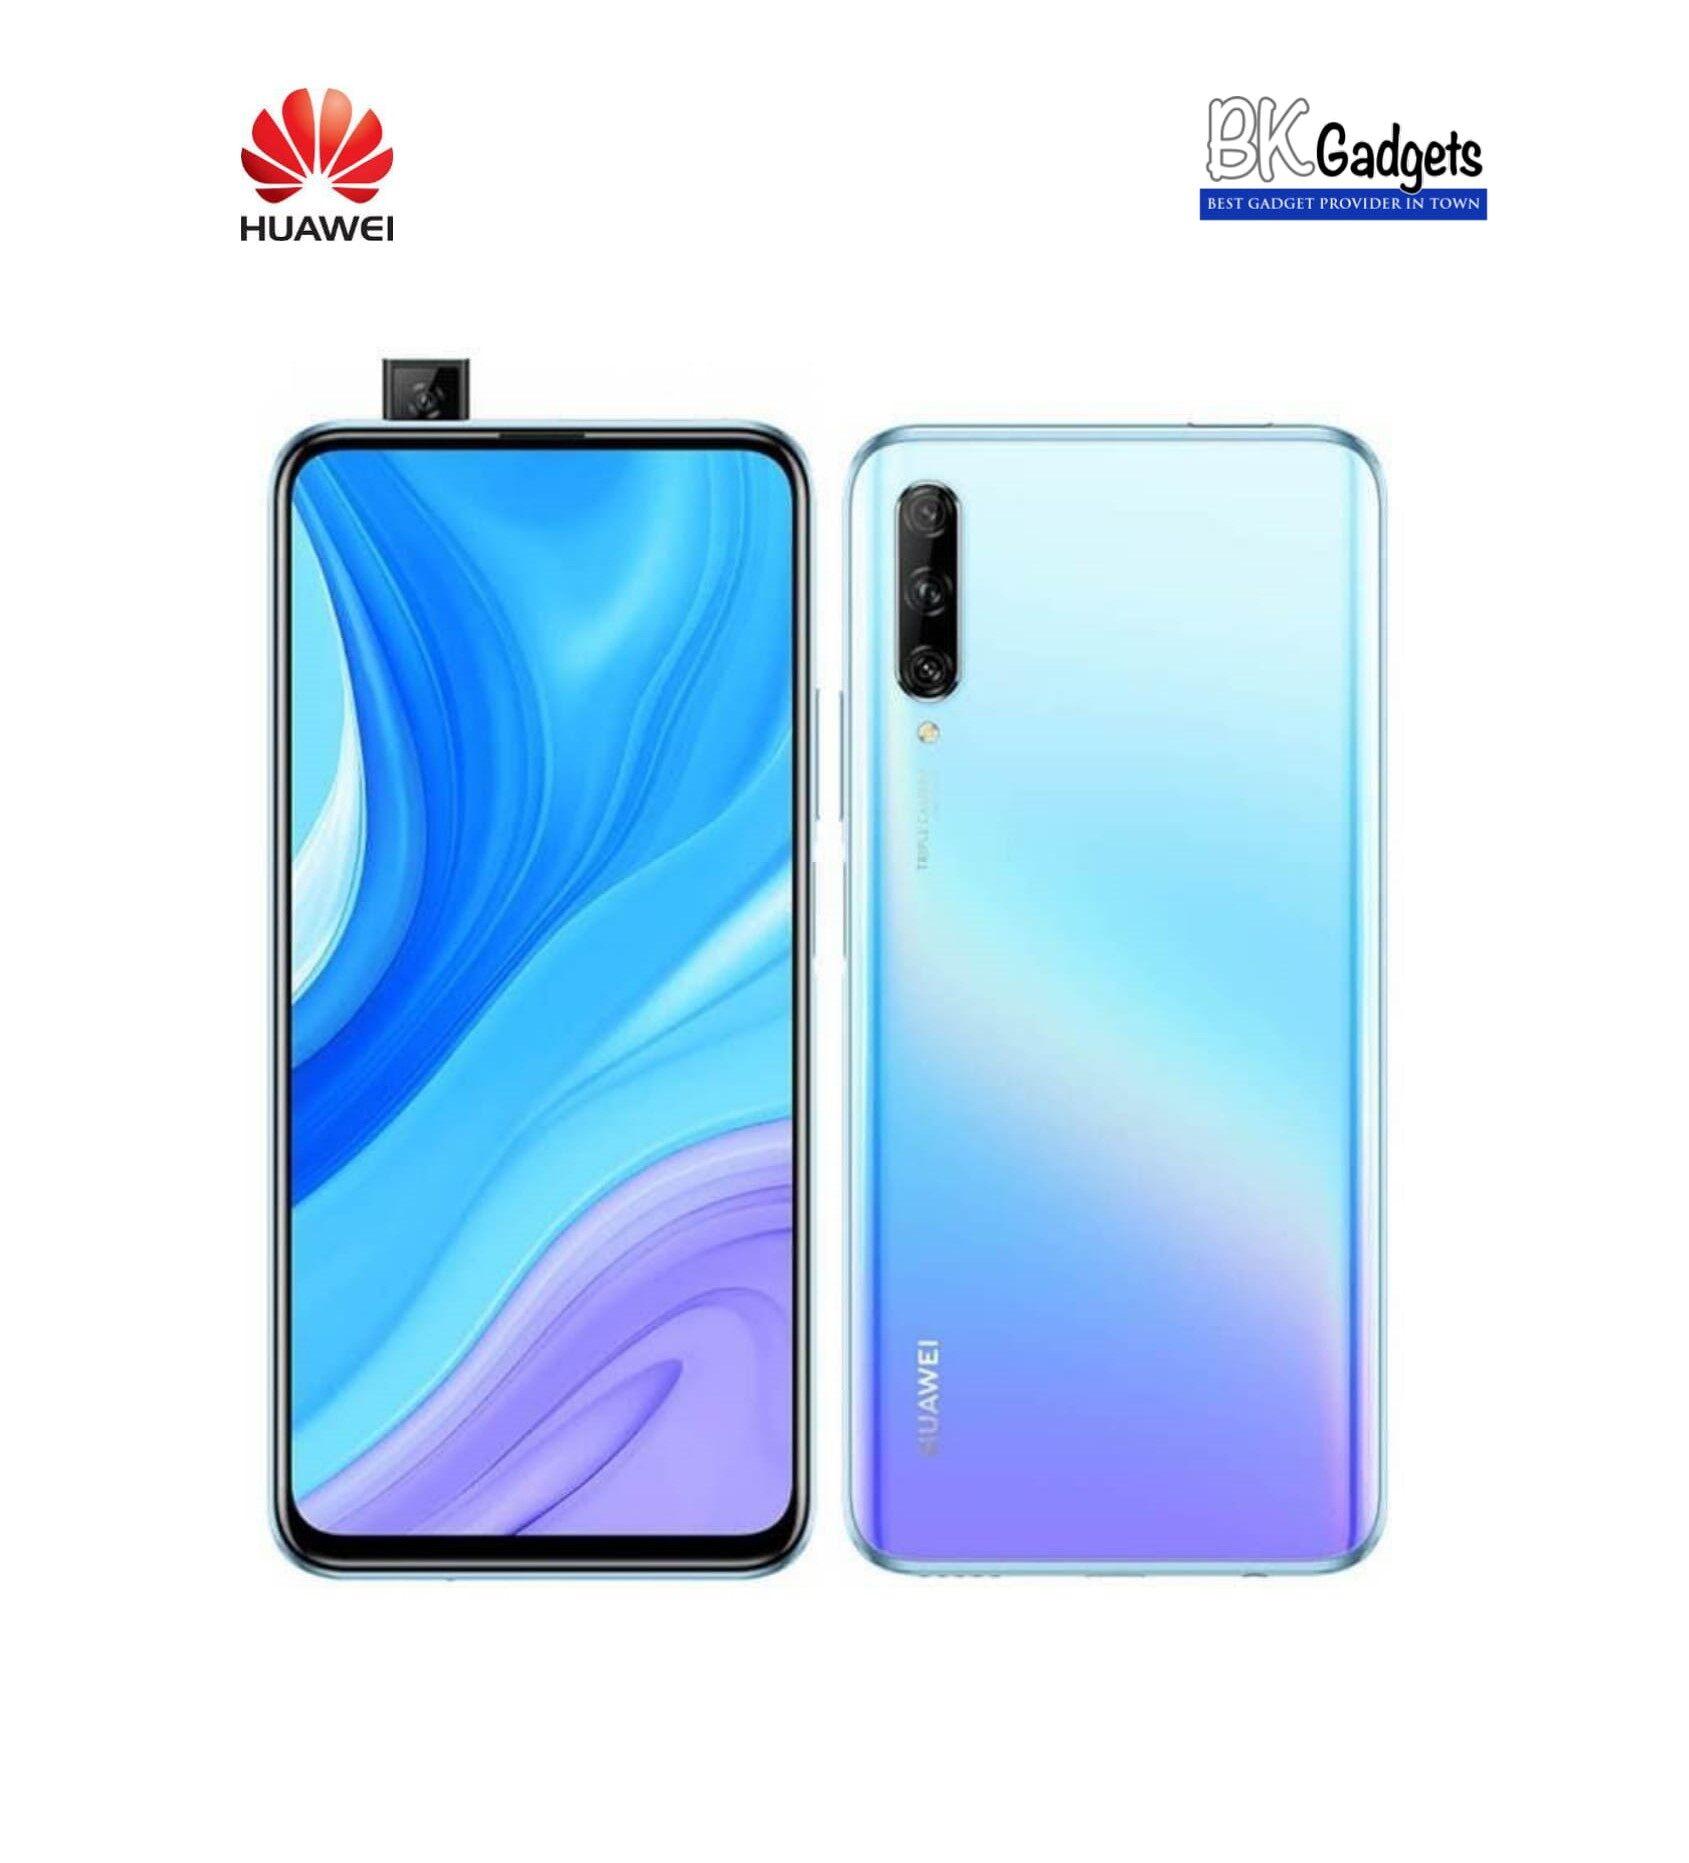 HUAWEI Y9s Breathing Crystal [ 6GB + 128GB ] Smartphone